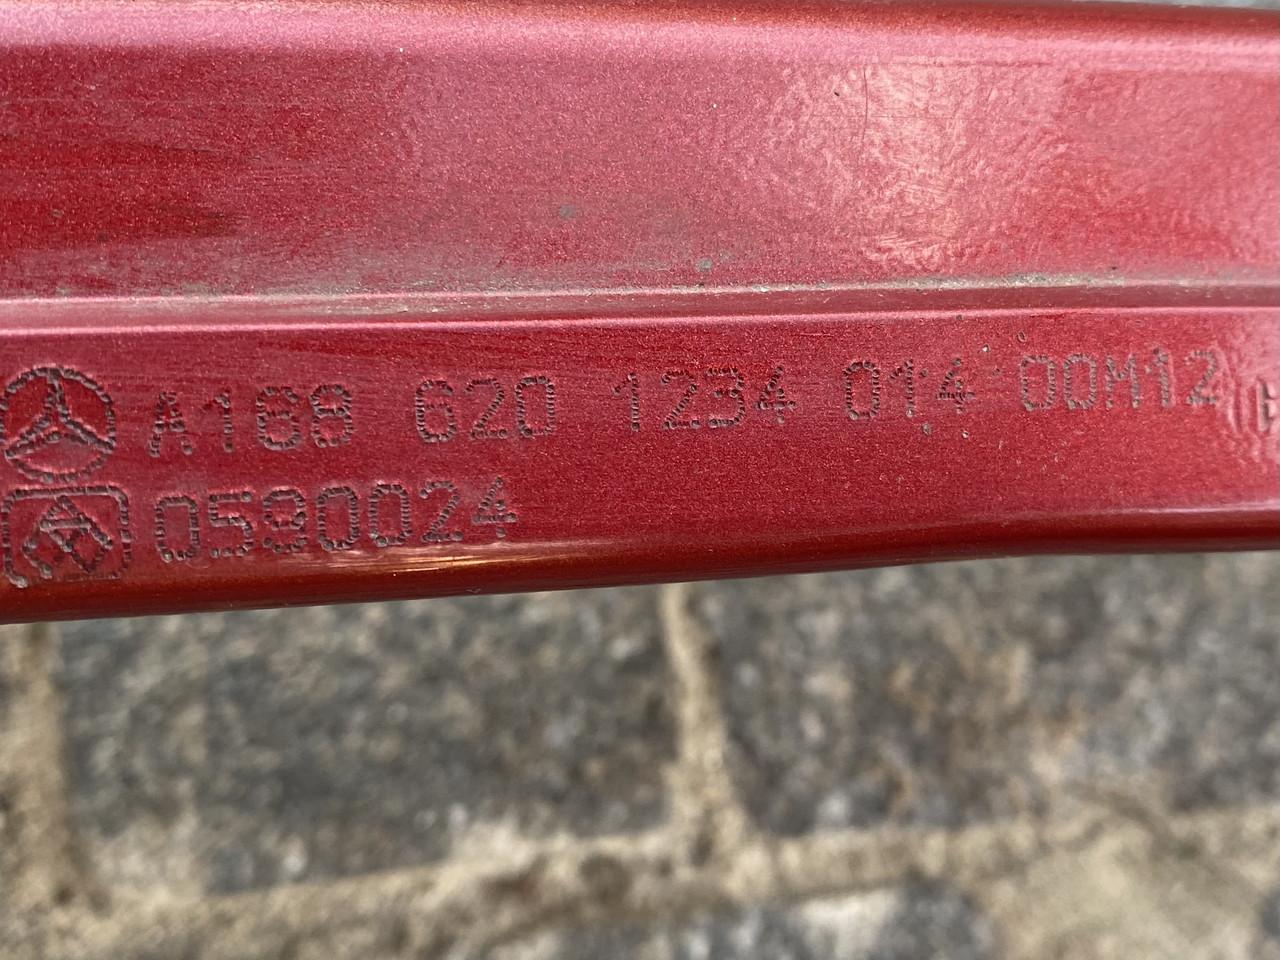 Усилитель переднего бампера mercedes a1686201234  a-class w168 1997-2004